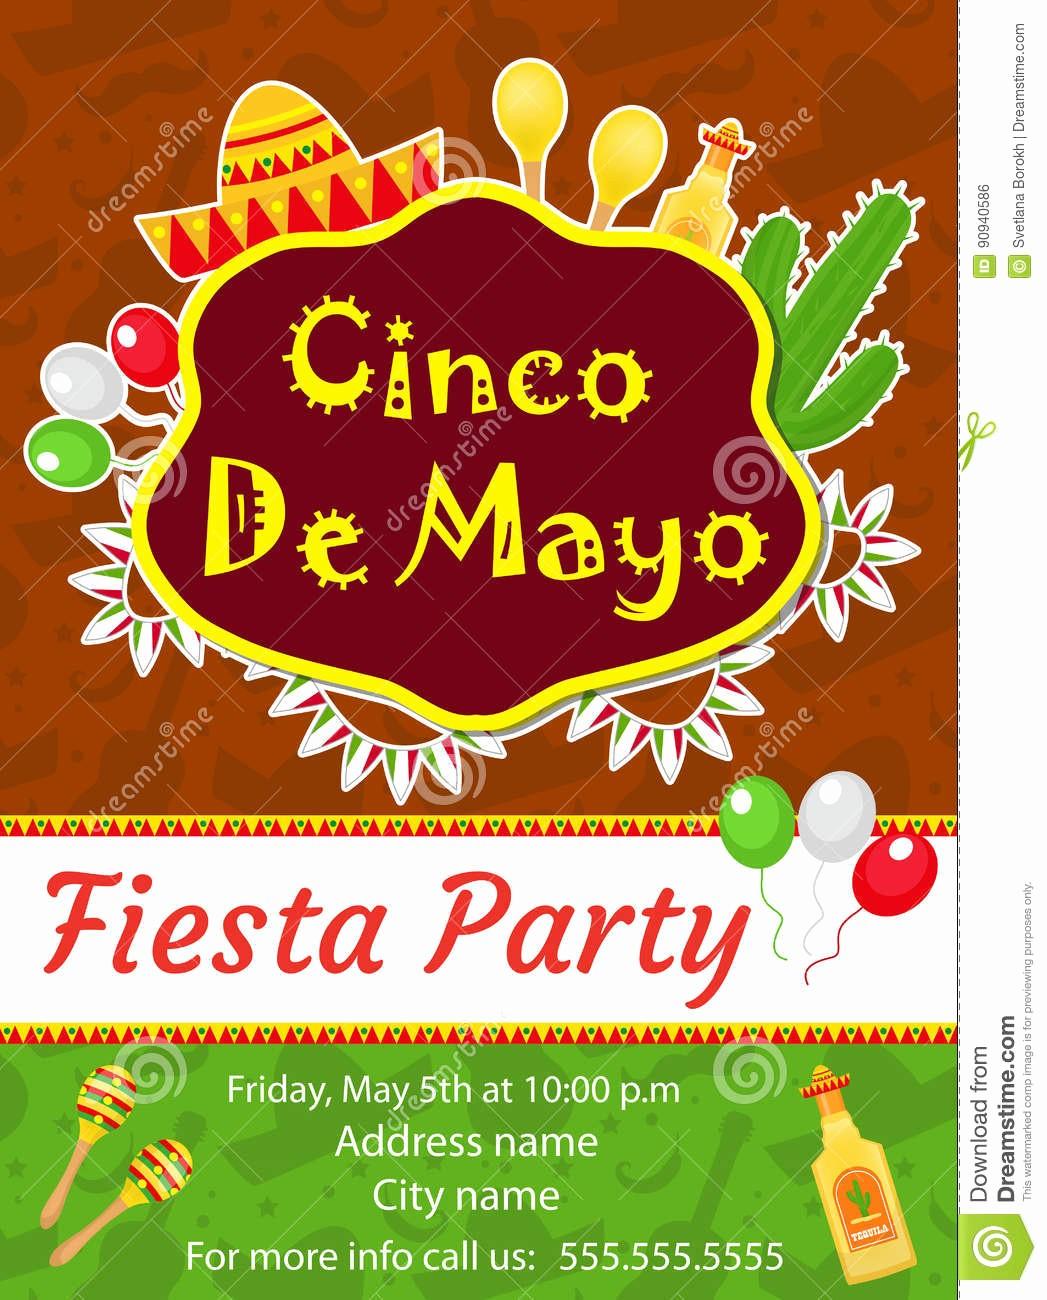 Cinco De Mayo Invite Template New Cinco De Mayo Invitation Template Flyer Mexican Holiday